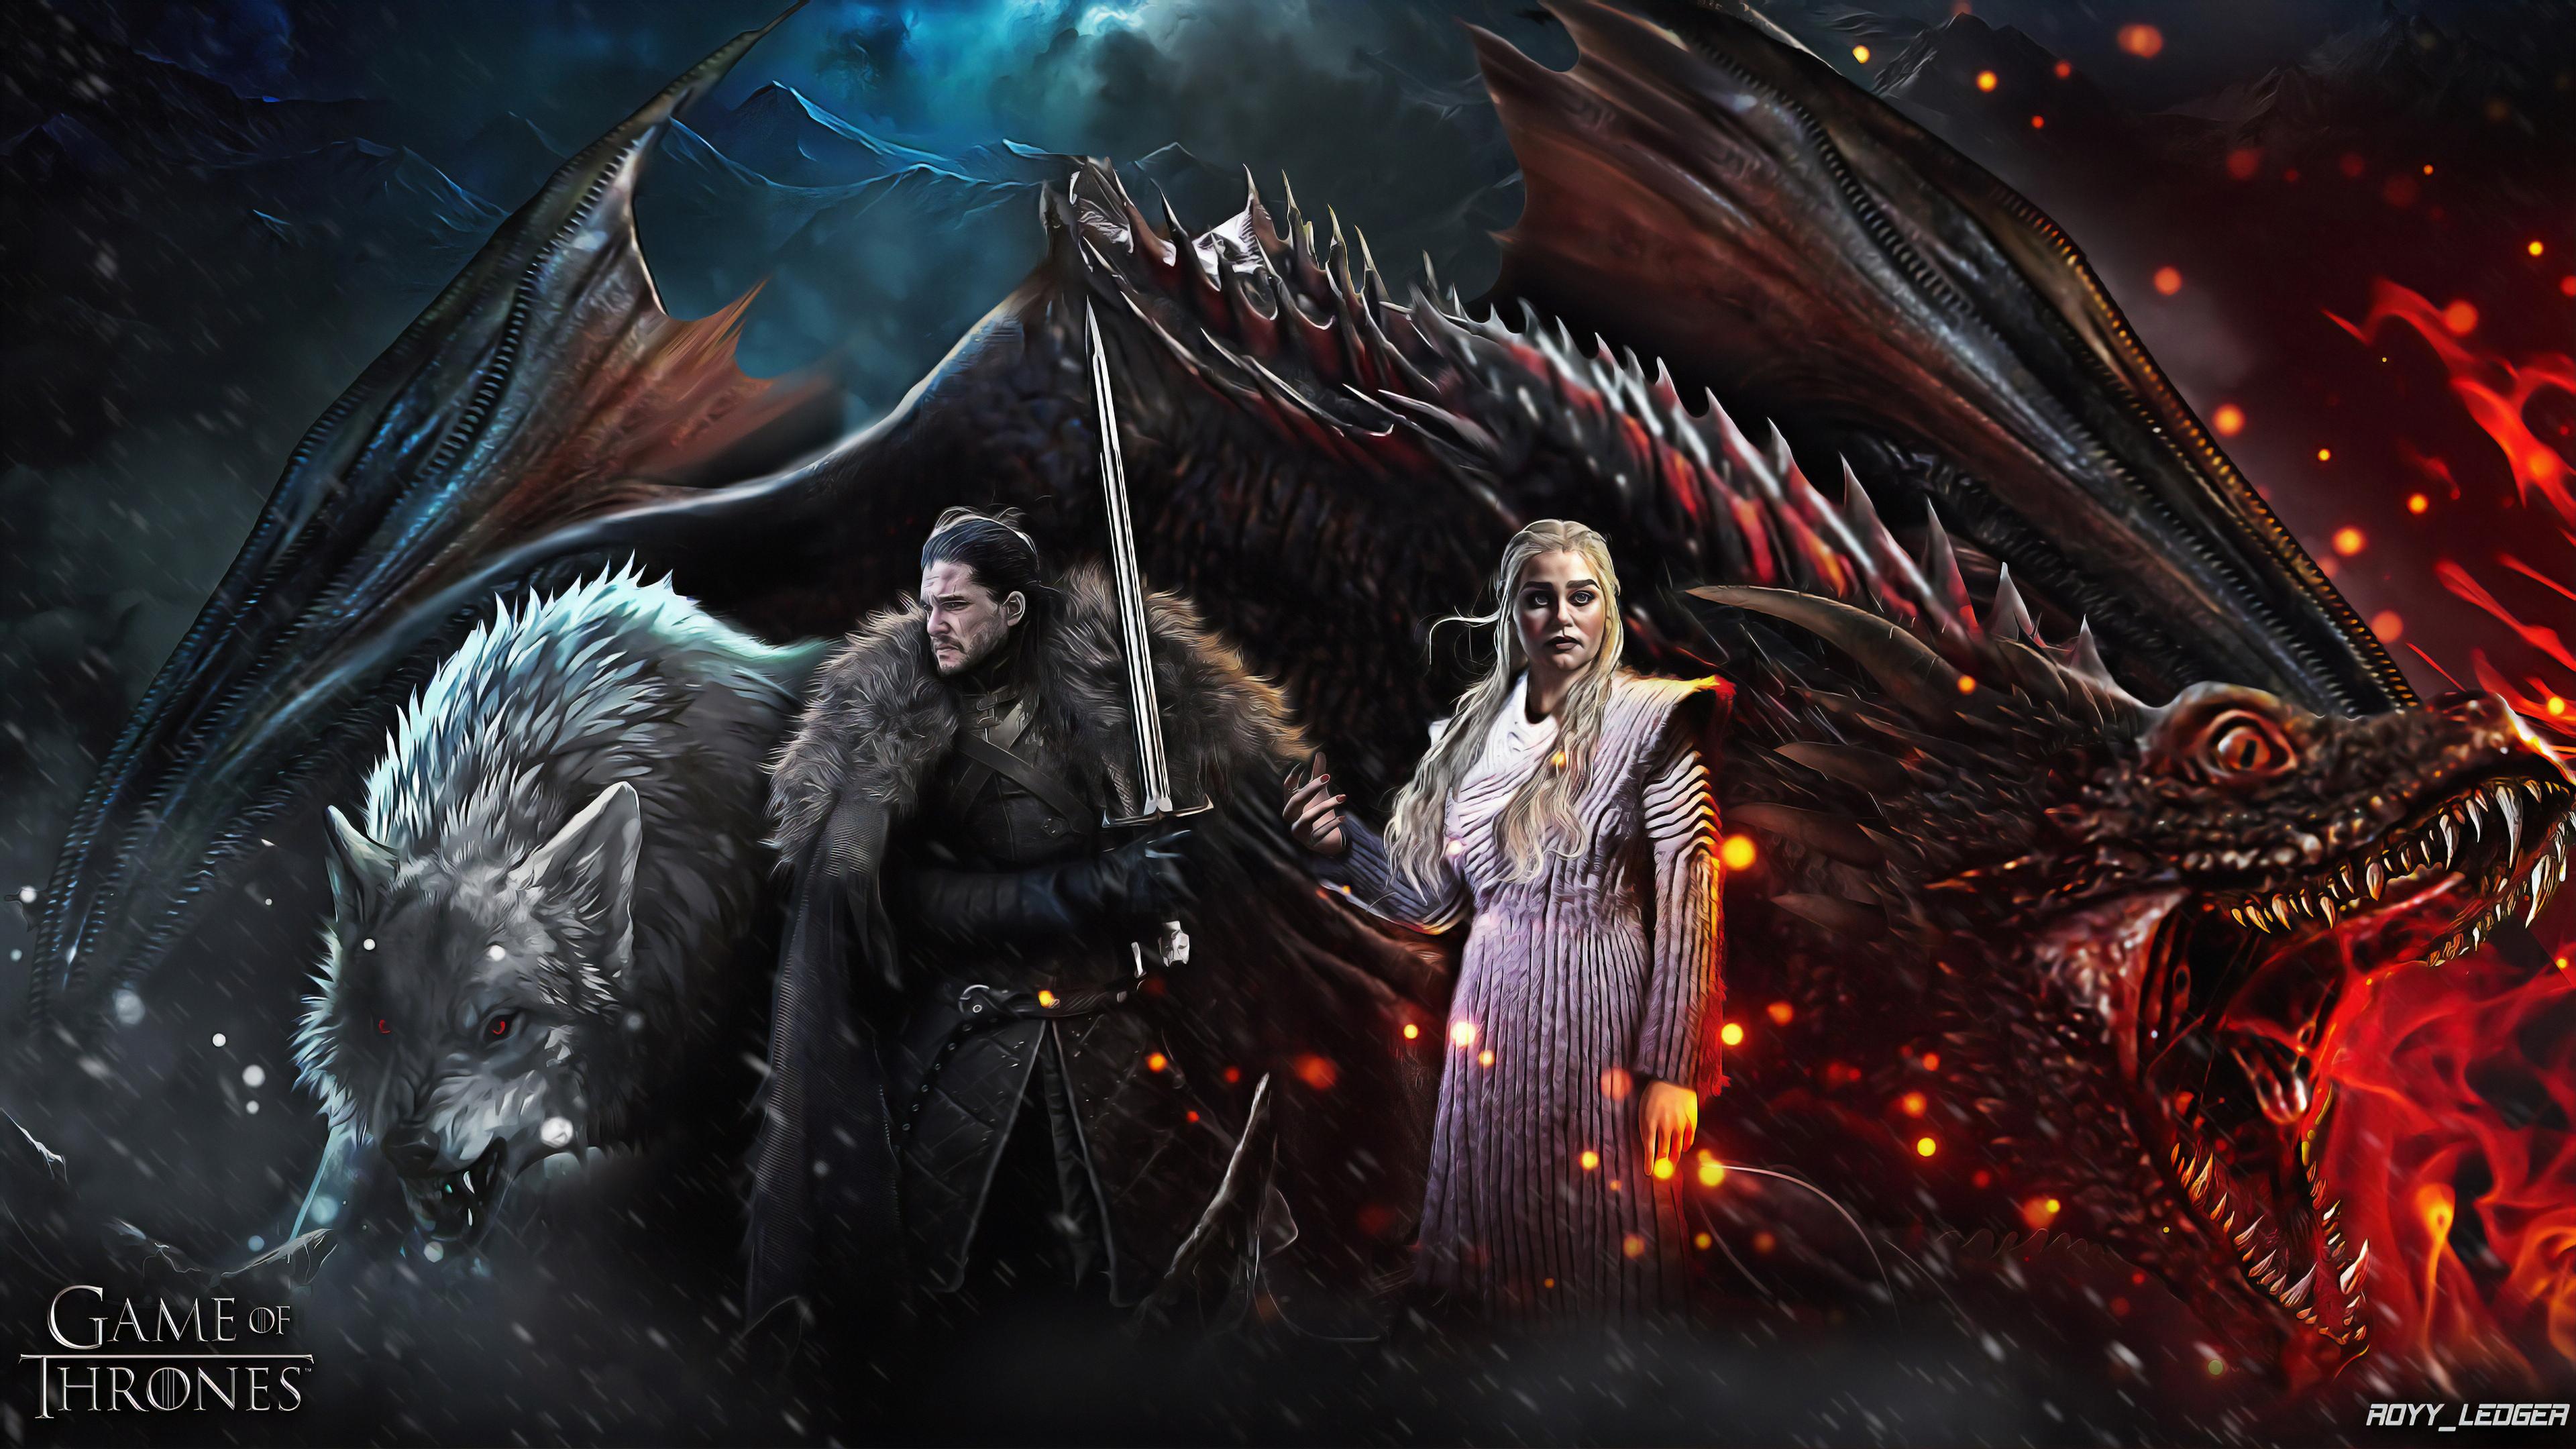 game of thrones season 8 art 1577915090 - Game Of Thrones Season 8 Art -